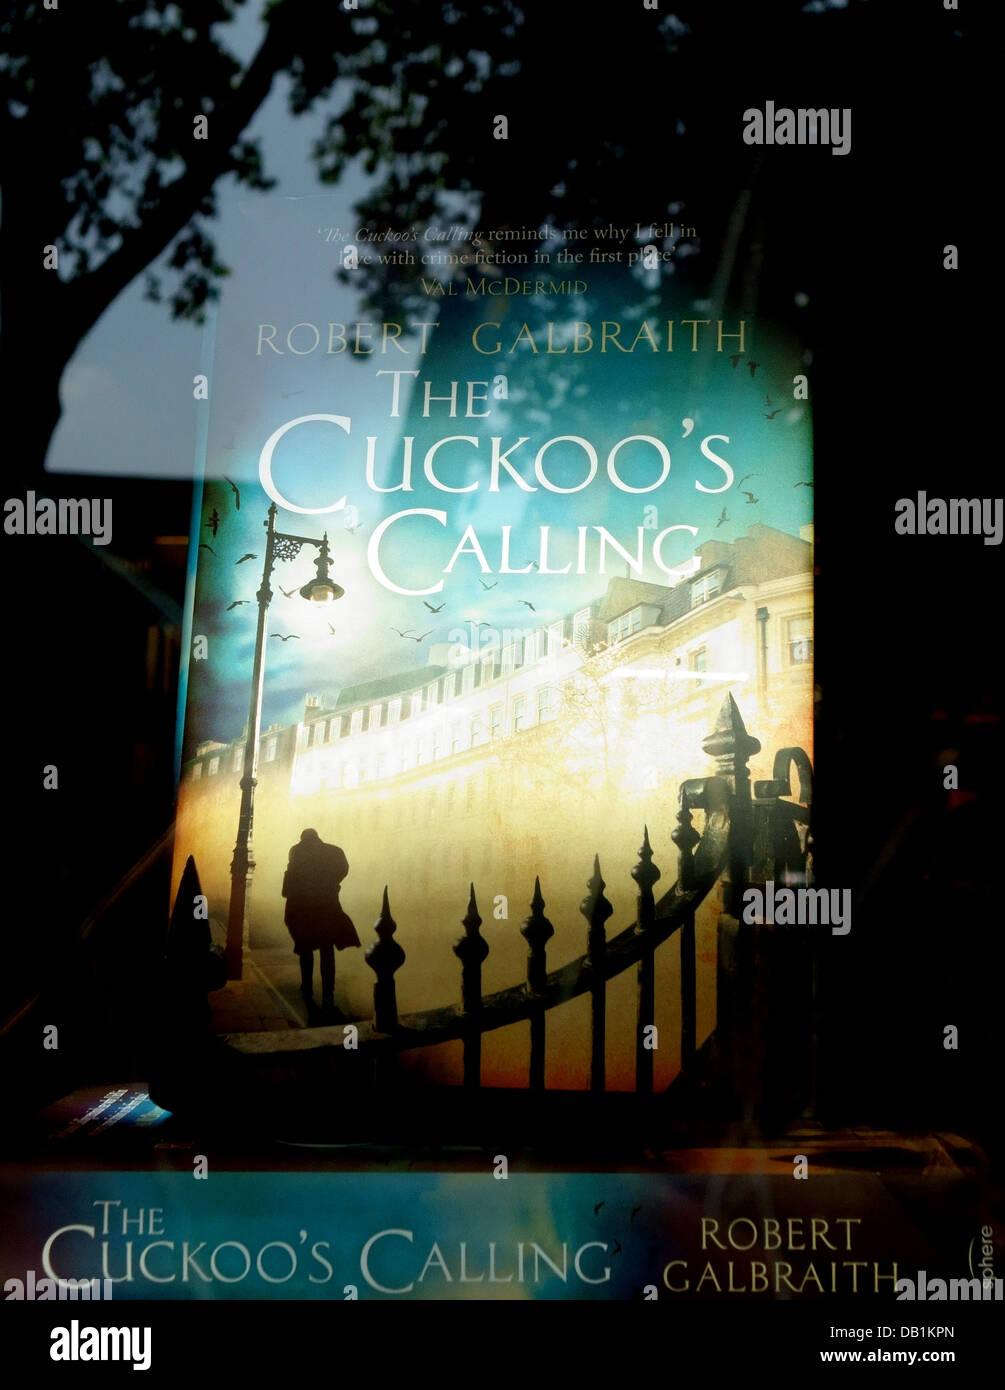 The Cuckoo's Calling by Robert Galbraith (J K Rowling) in London bookshop - Stock Image